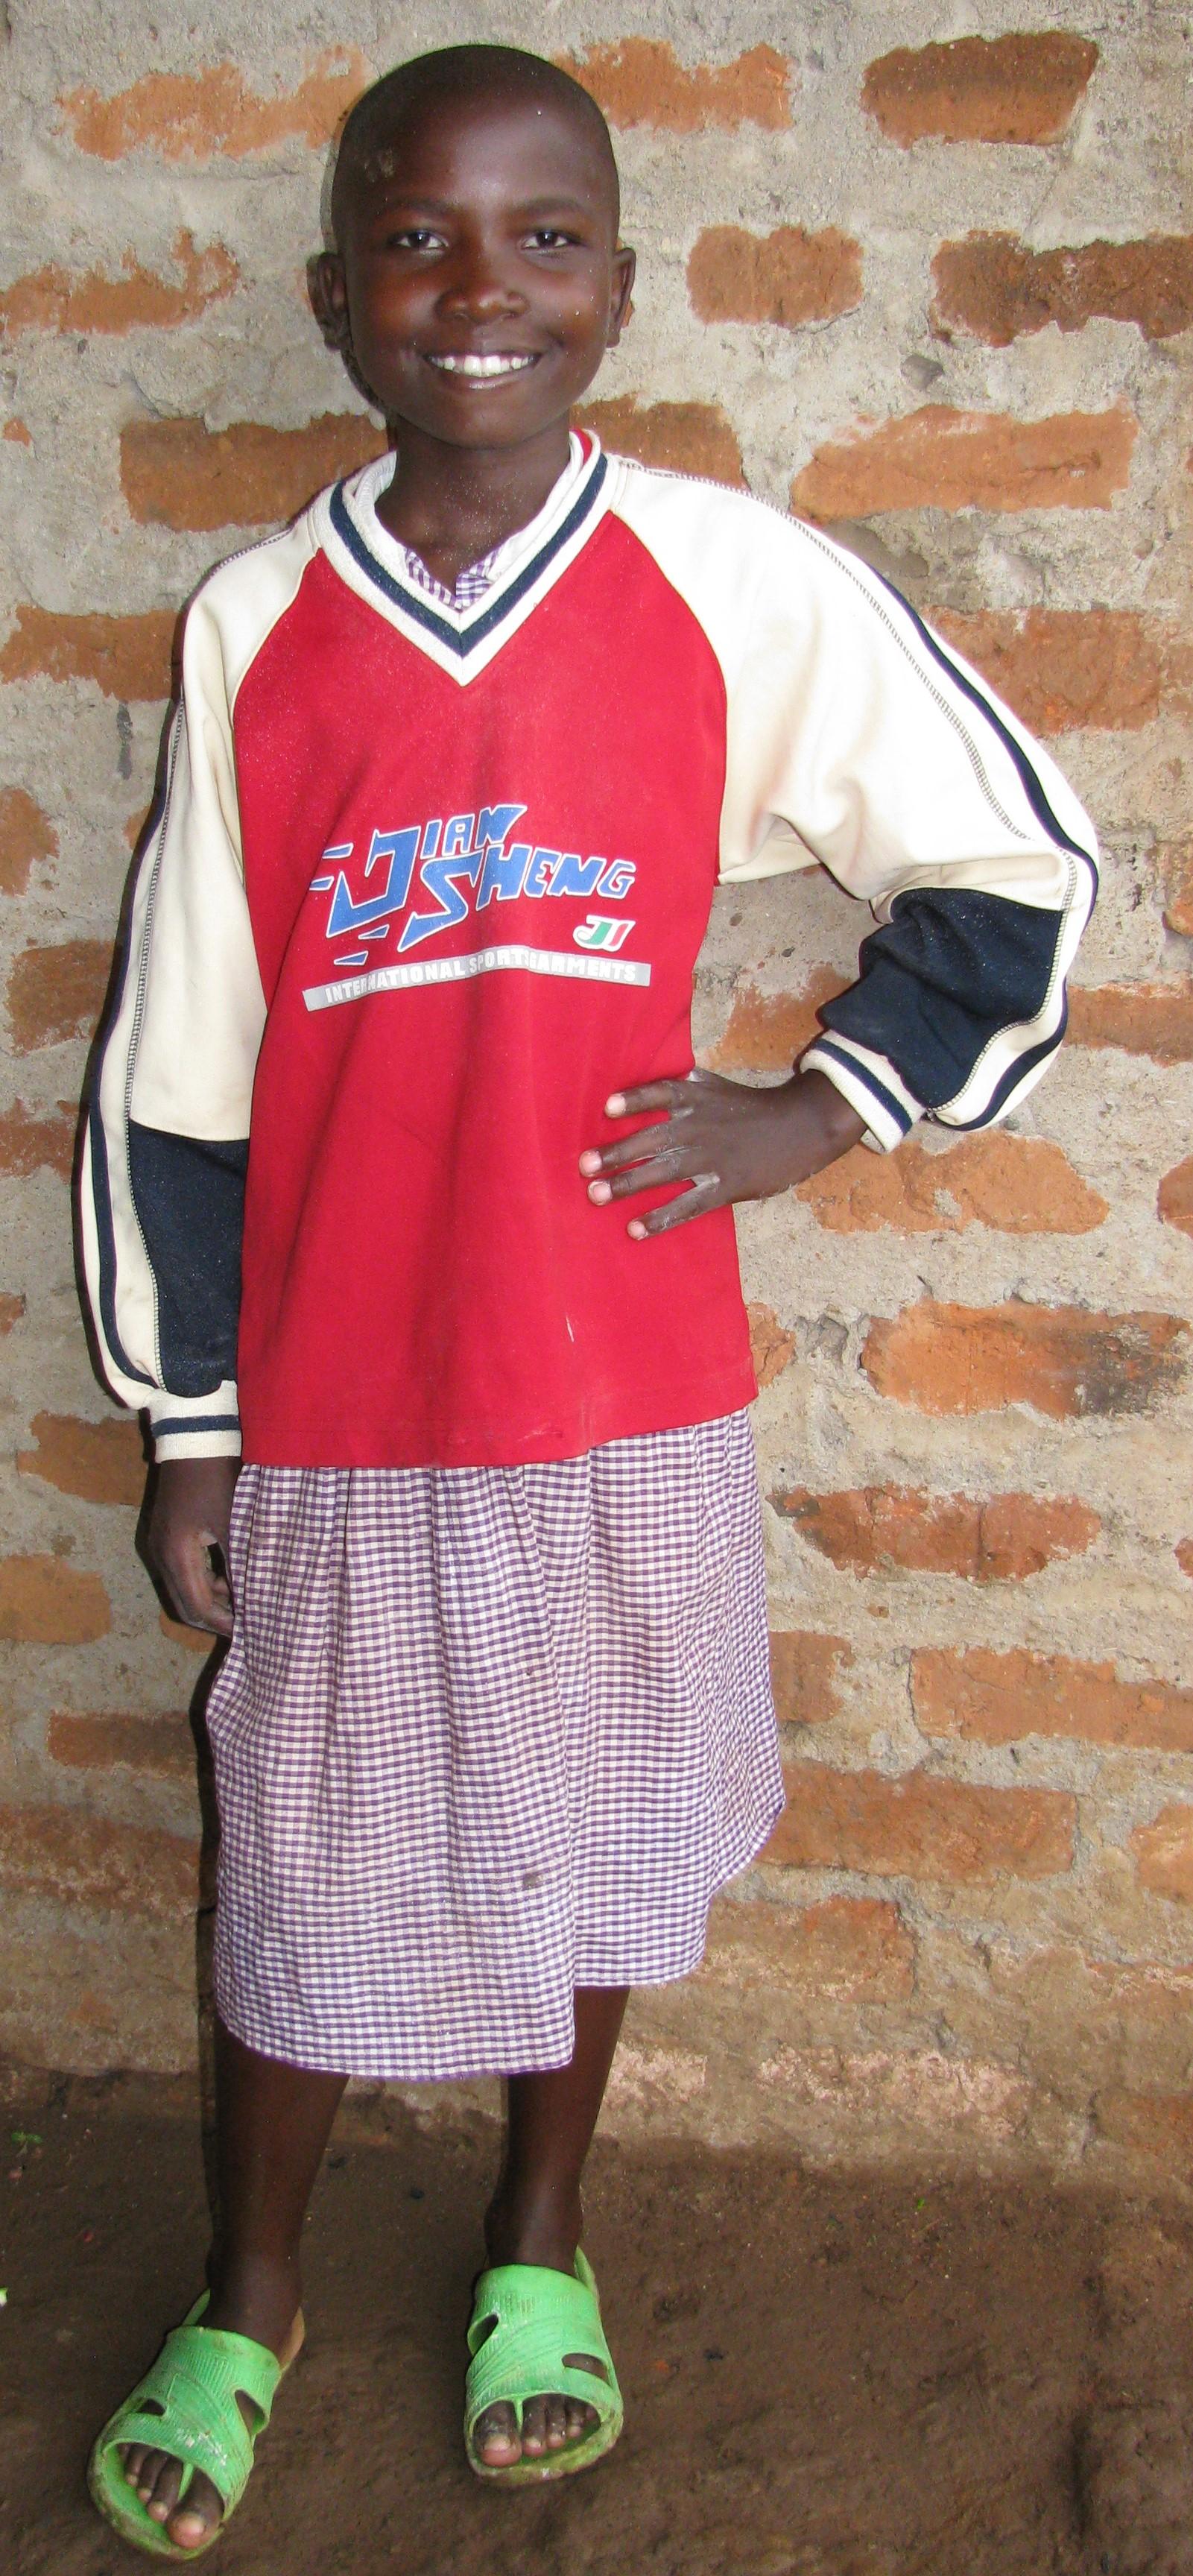 Robinah Teresa - 11 years